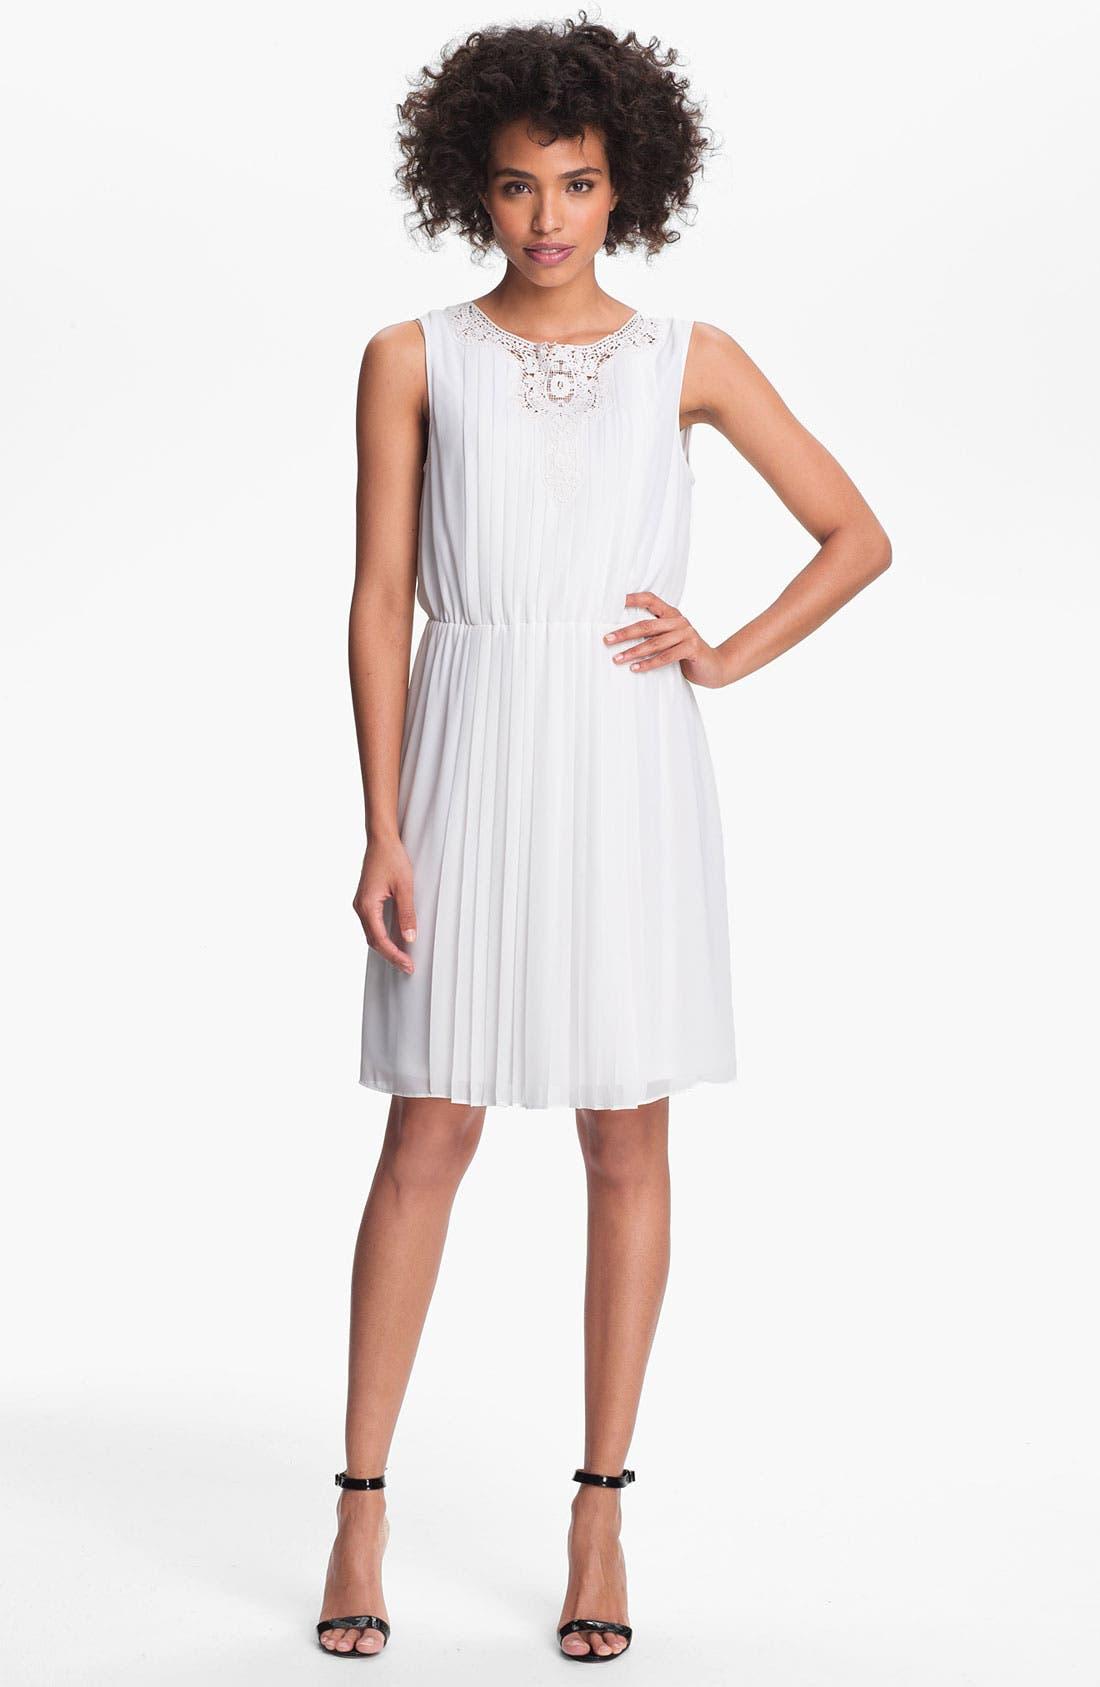 Alternate Image 1 Selected - Jessica Simpson 'Cabaret' Pleated Chiffon Dress